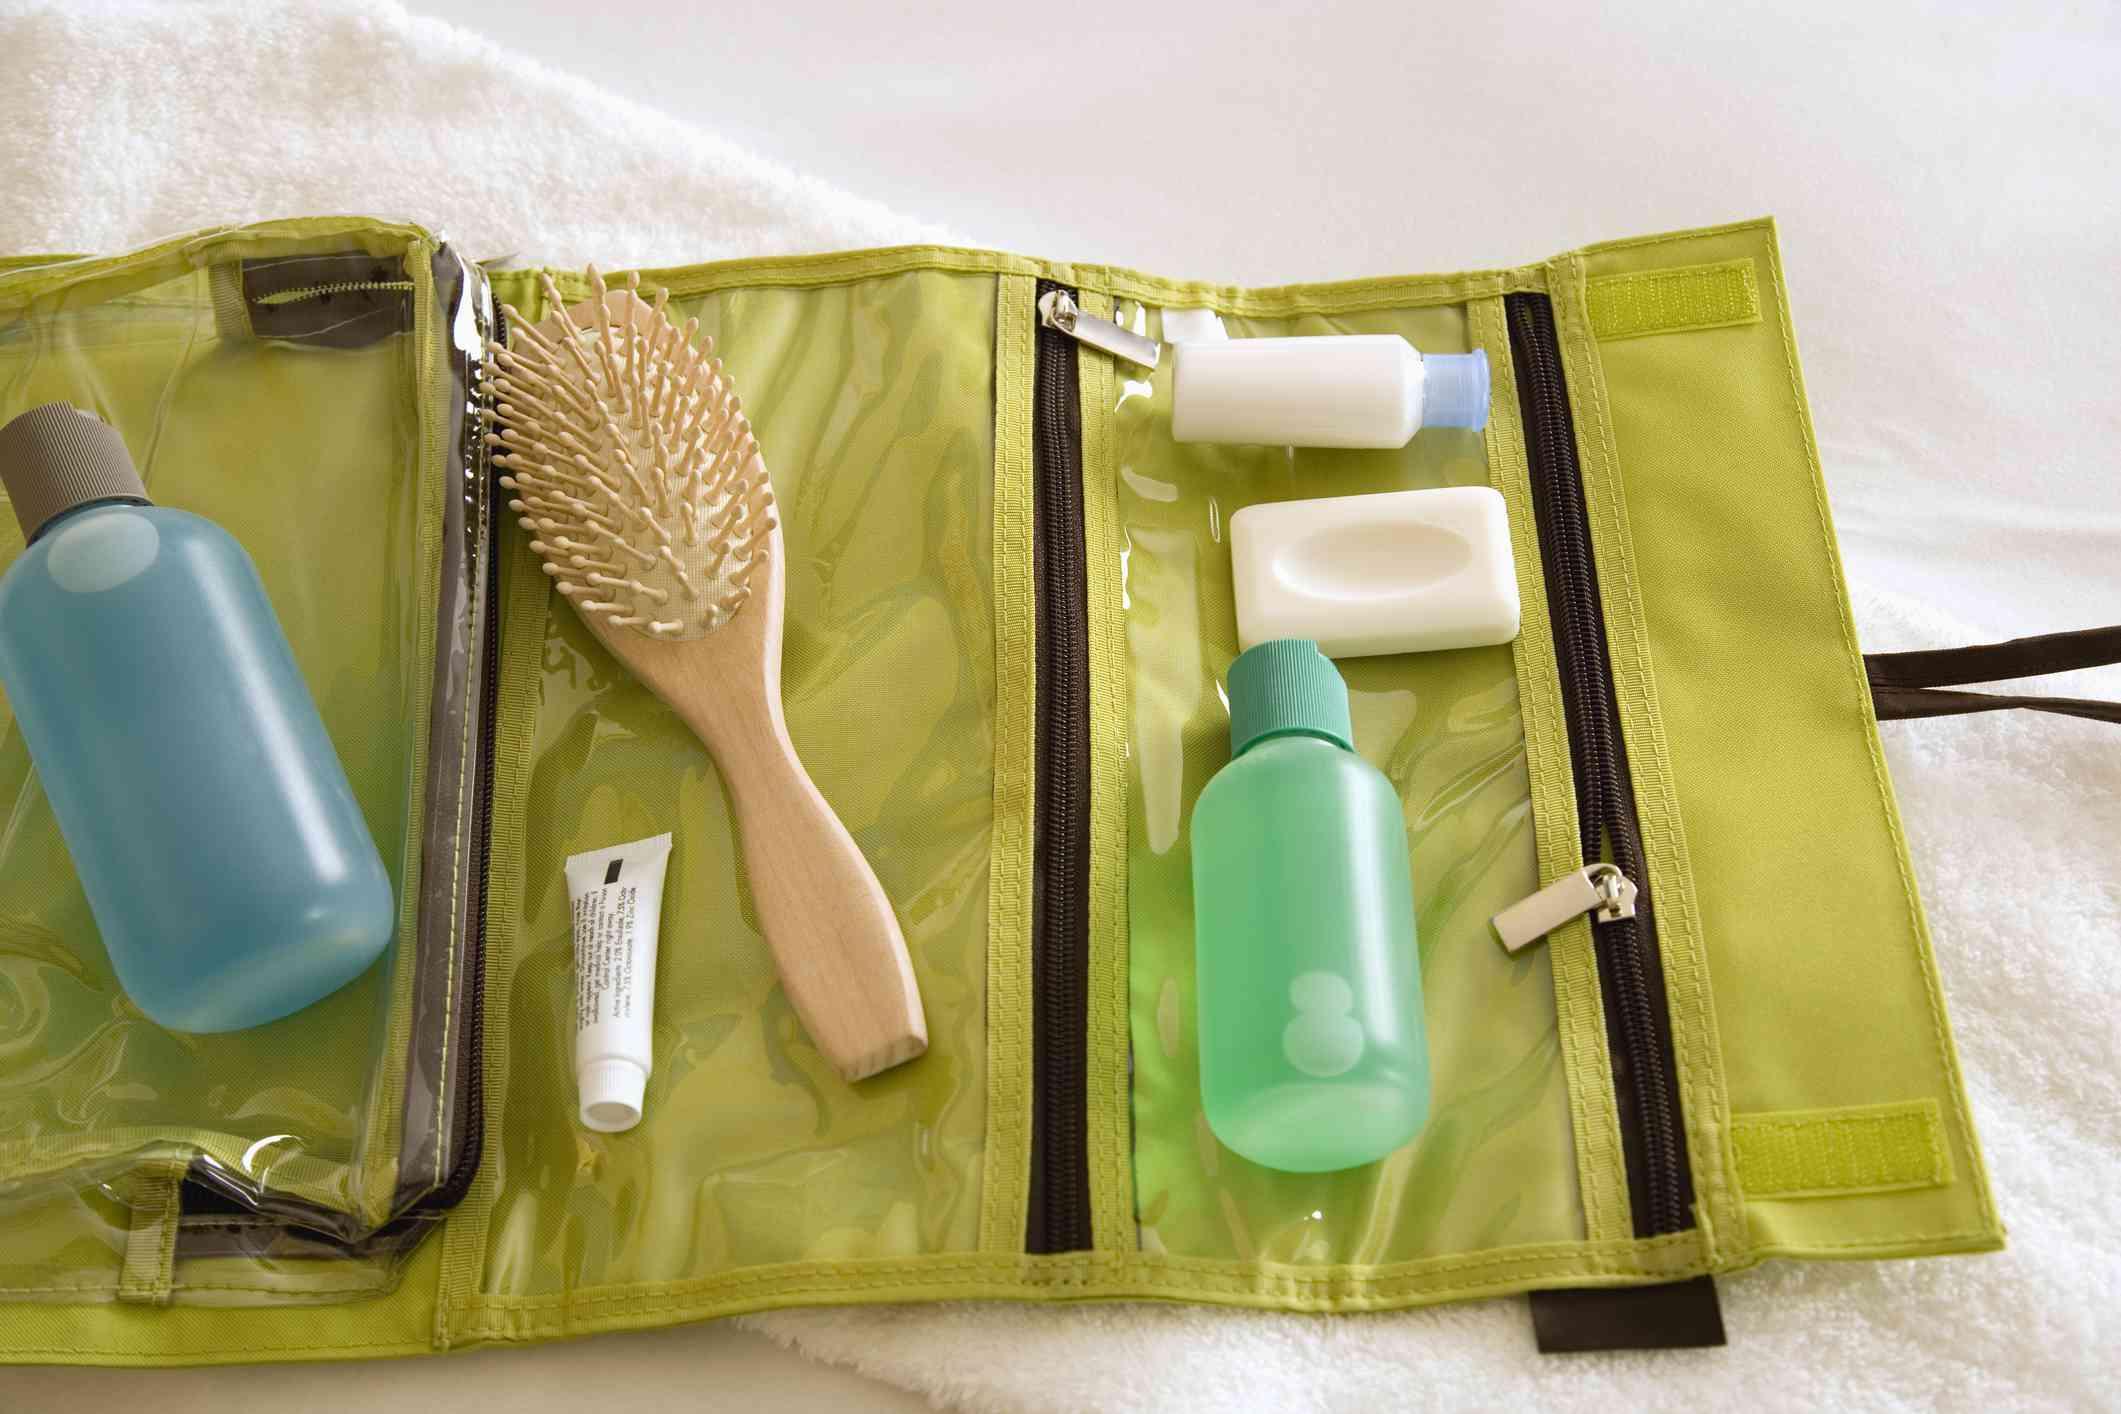 Toiletries and travel kit